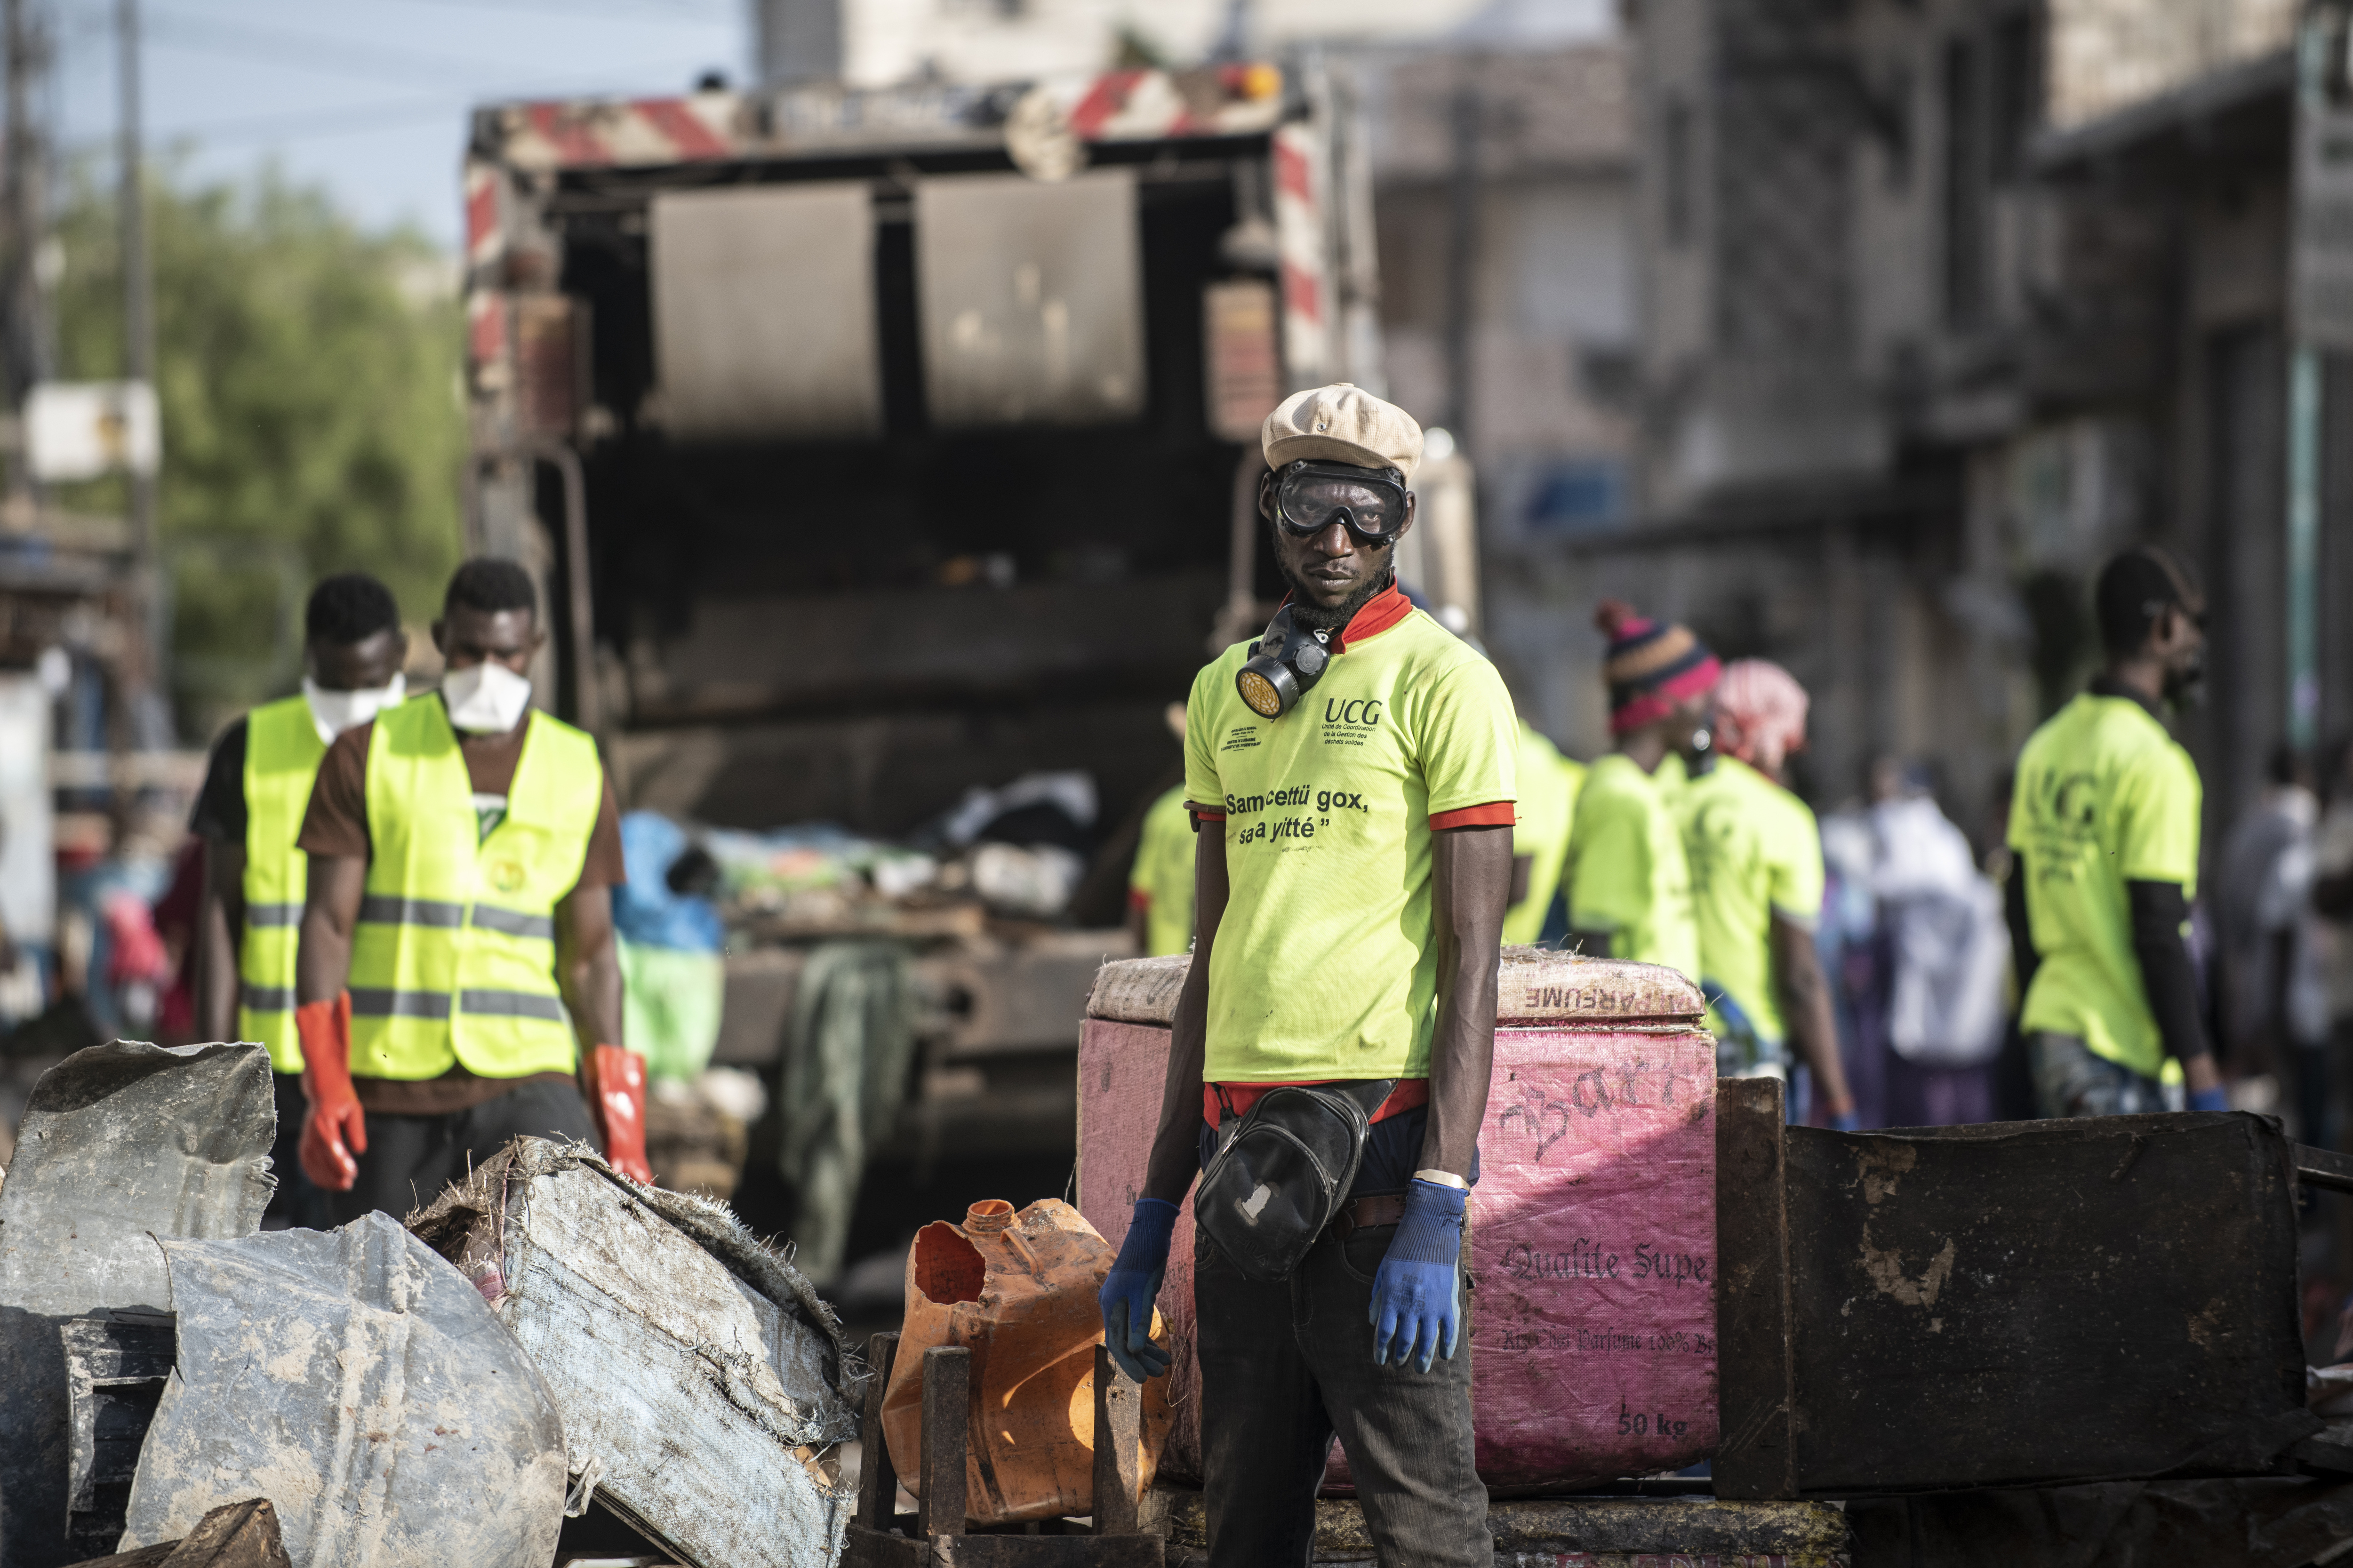 Municipal workers block streets as a bulldozer demolishes informal shops in an effort to stop the spread of the coronavirus in Dakar's popular Medina's neighborhood on March 22, 2020.